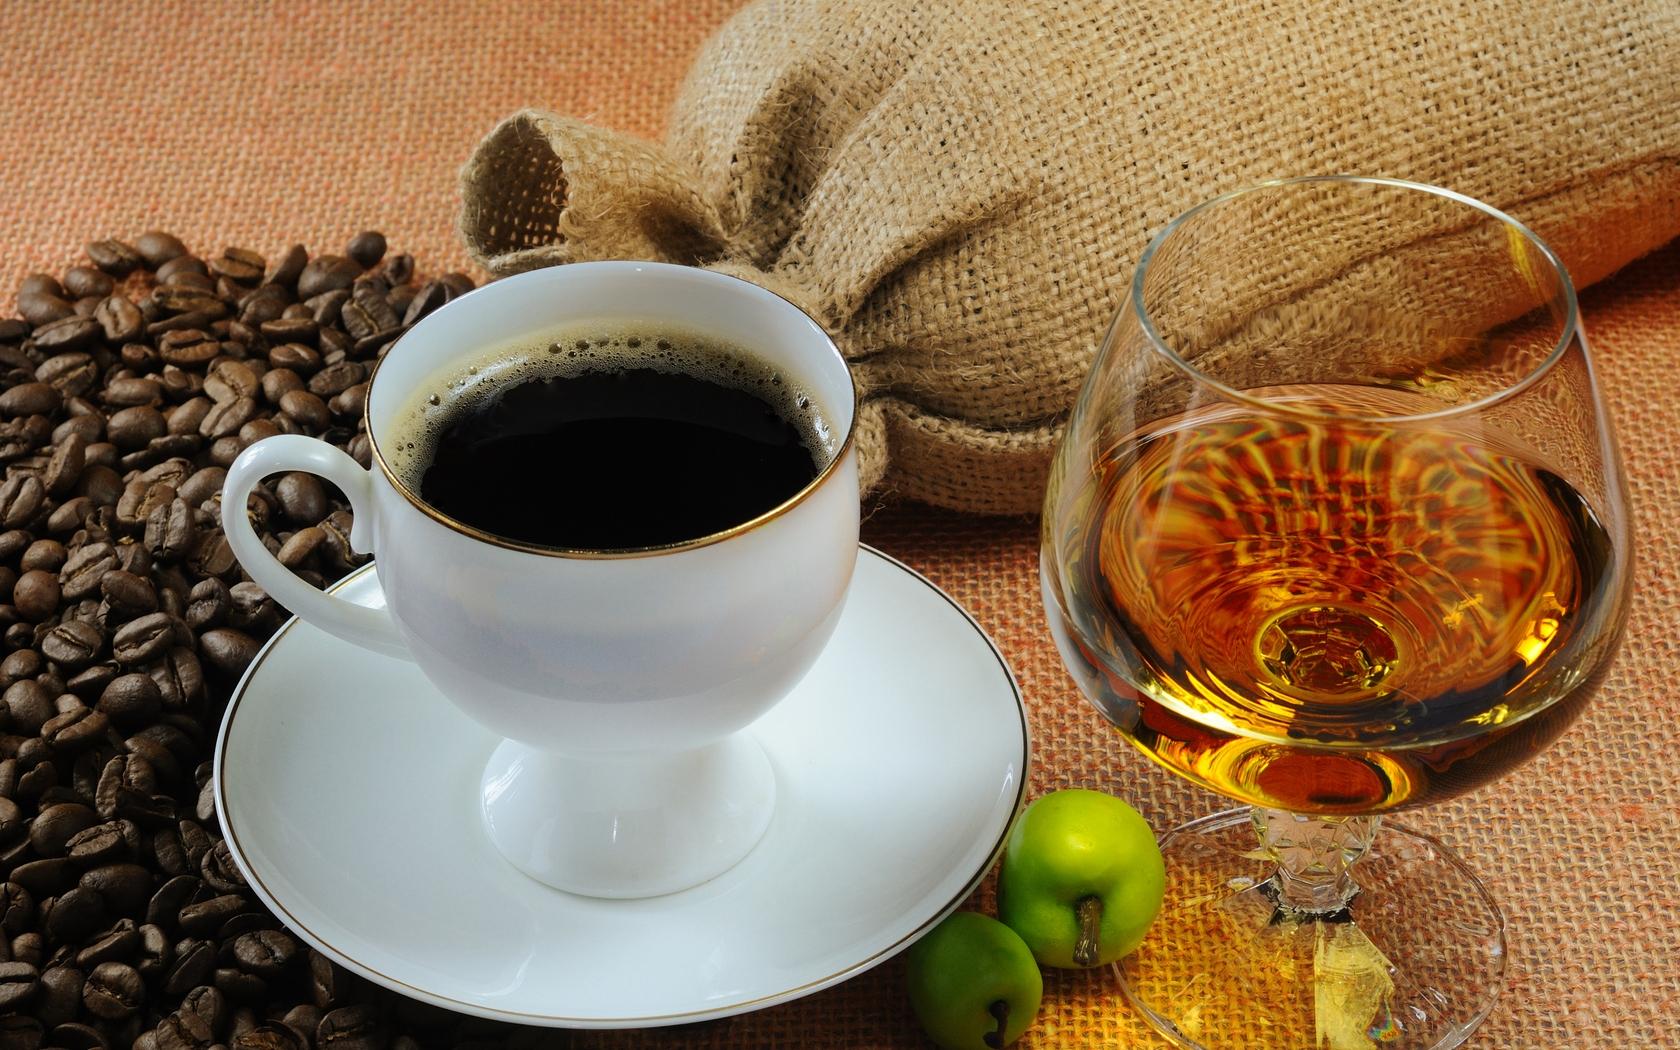 Hintergrundbilder : Kaffee, Äpfel, Getränk, Glas, Tee, Korn, Tasse ...